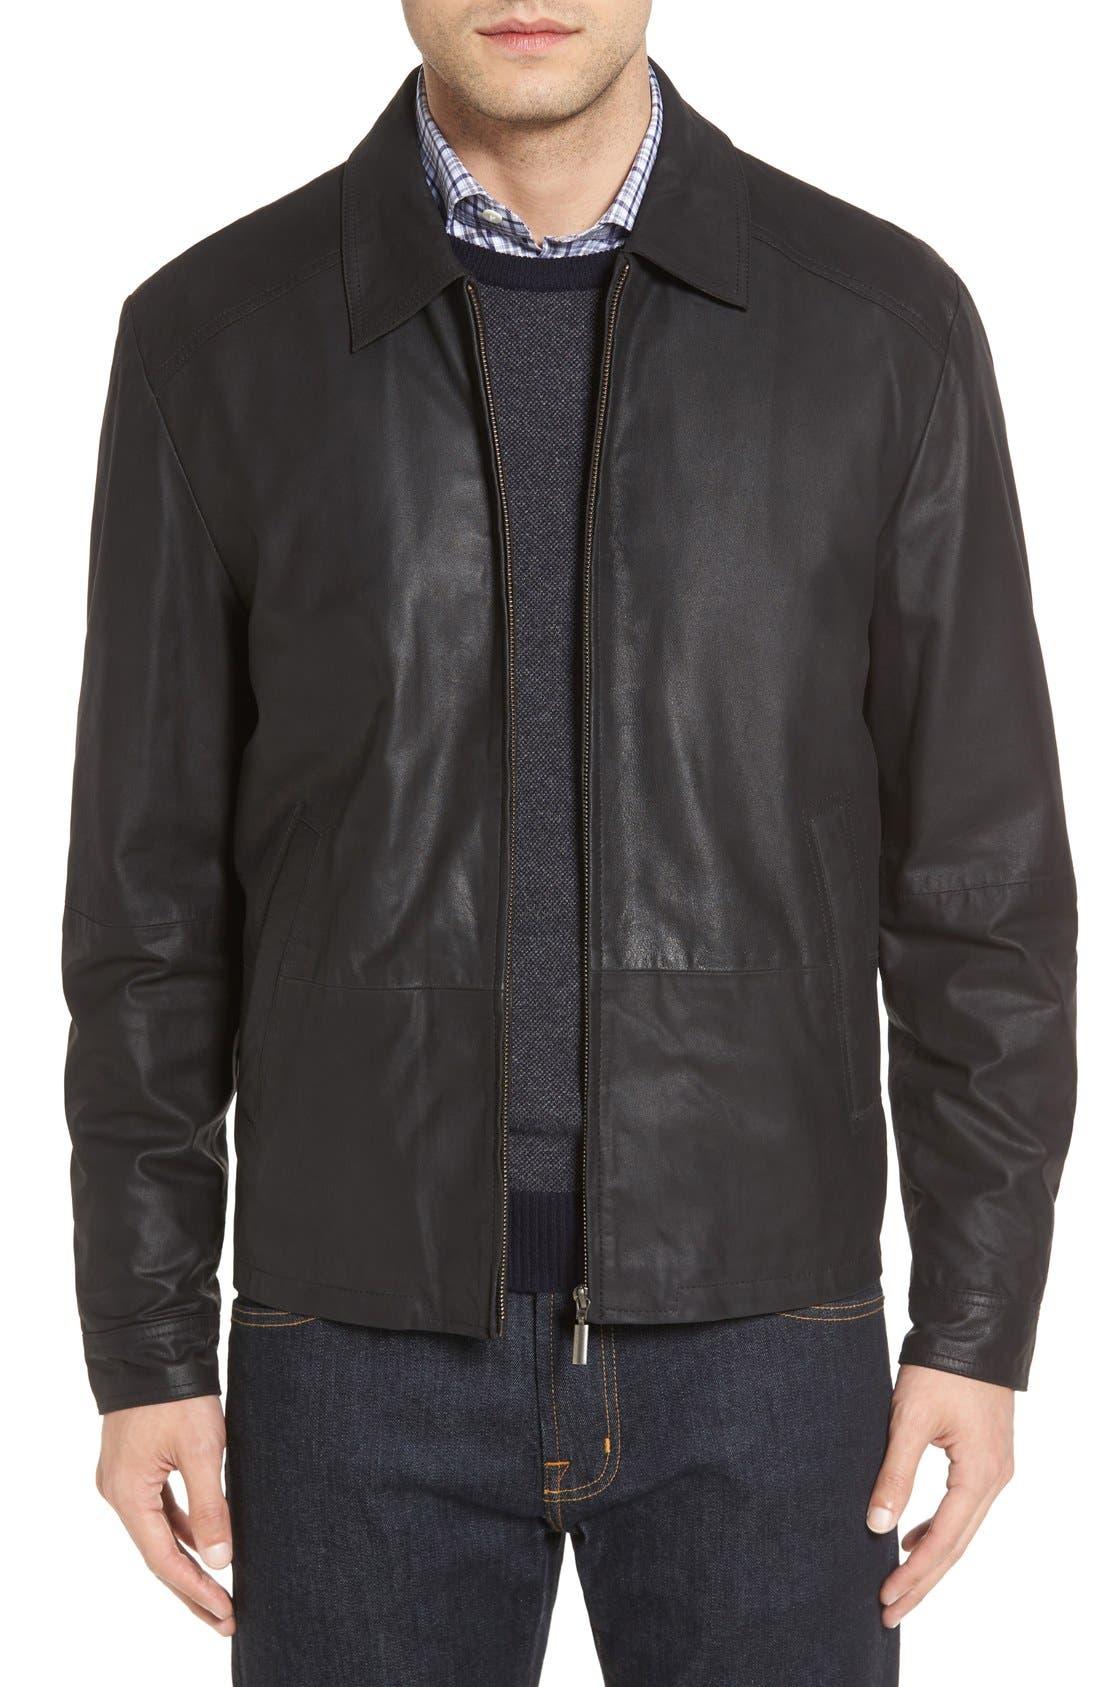 MISSANI LE COLLEZIONI MissaniLe CollezioniLambskin Leather Jacket